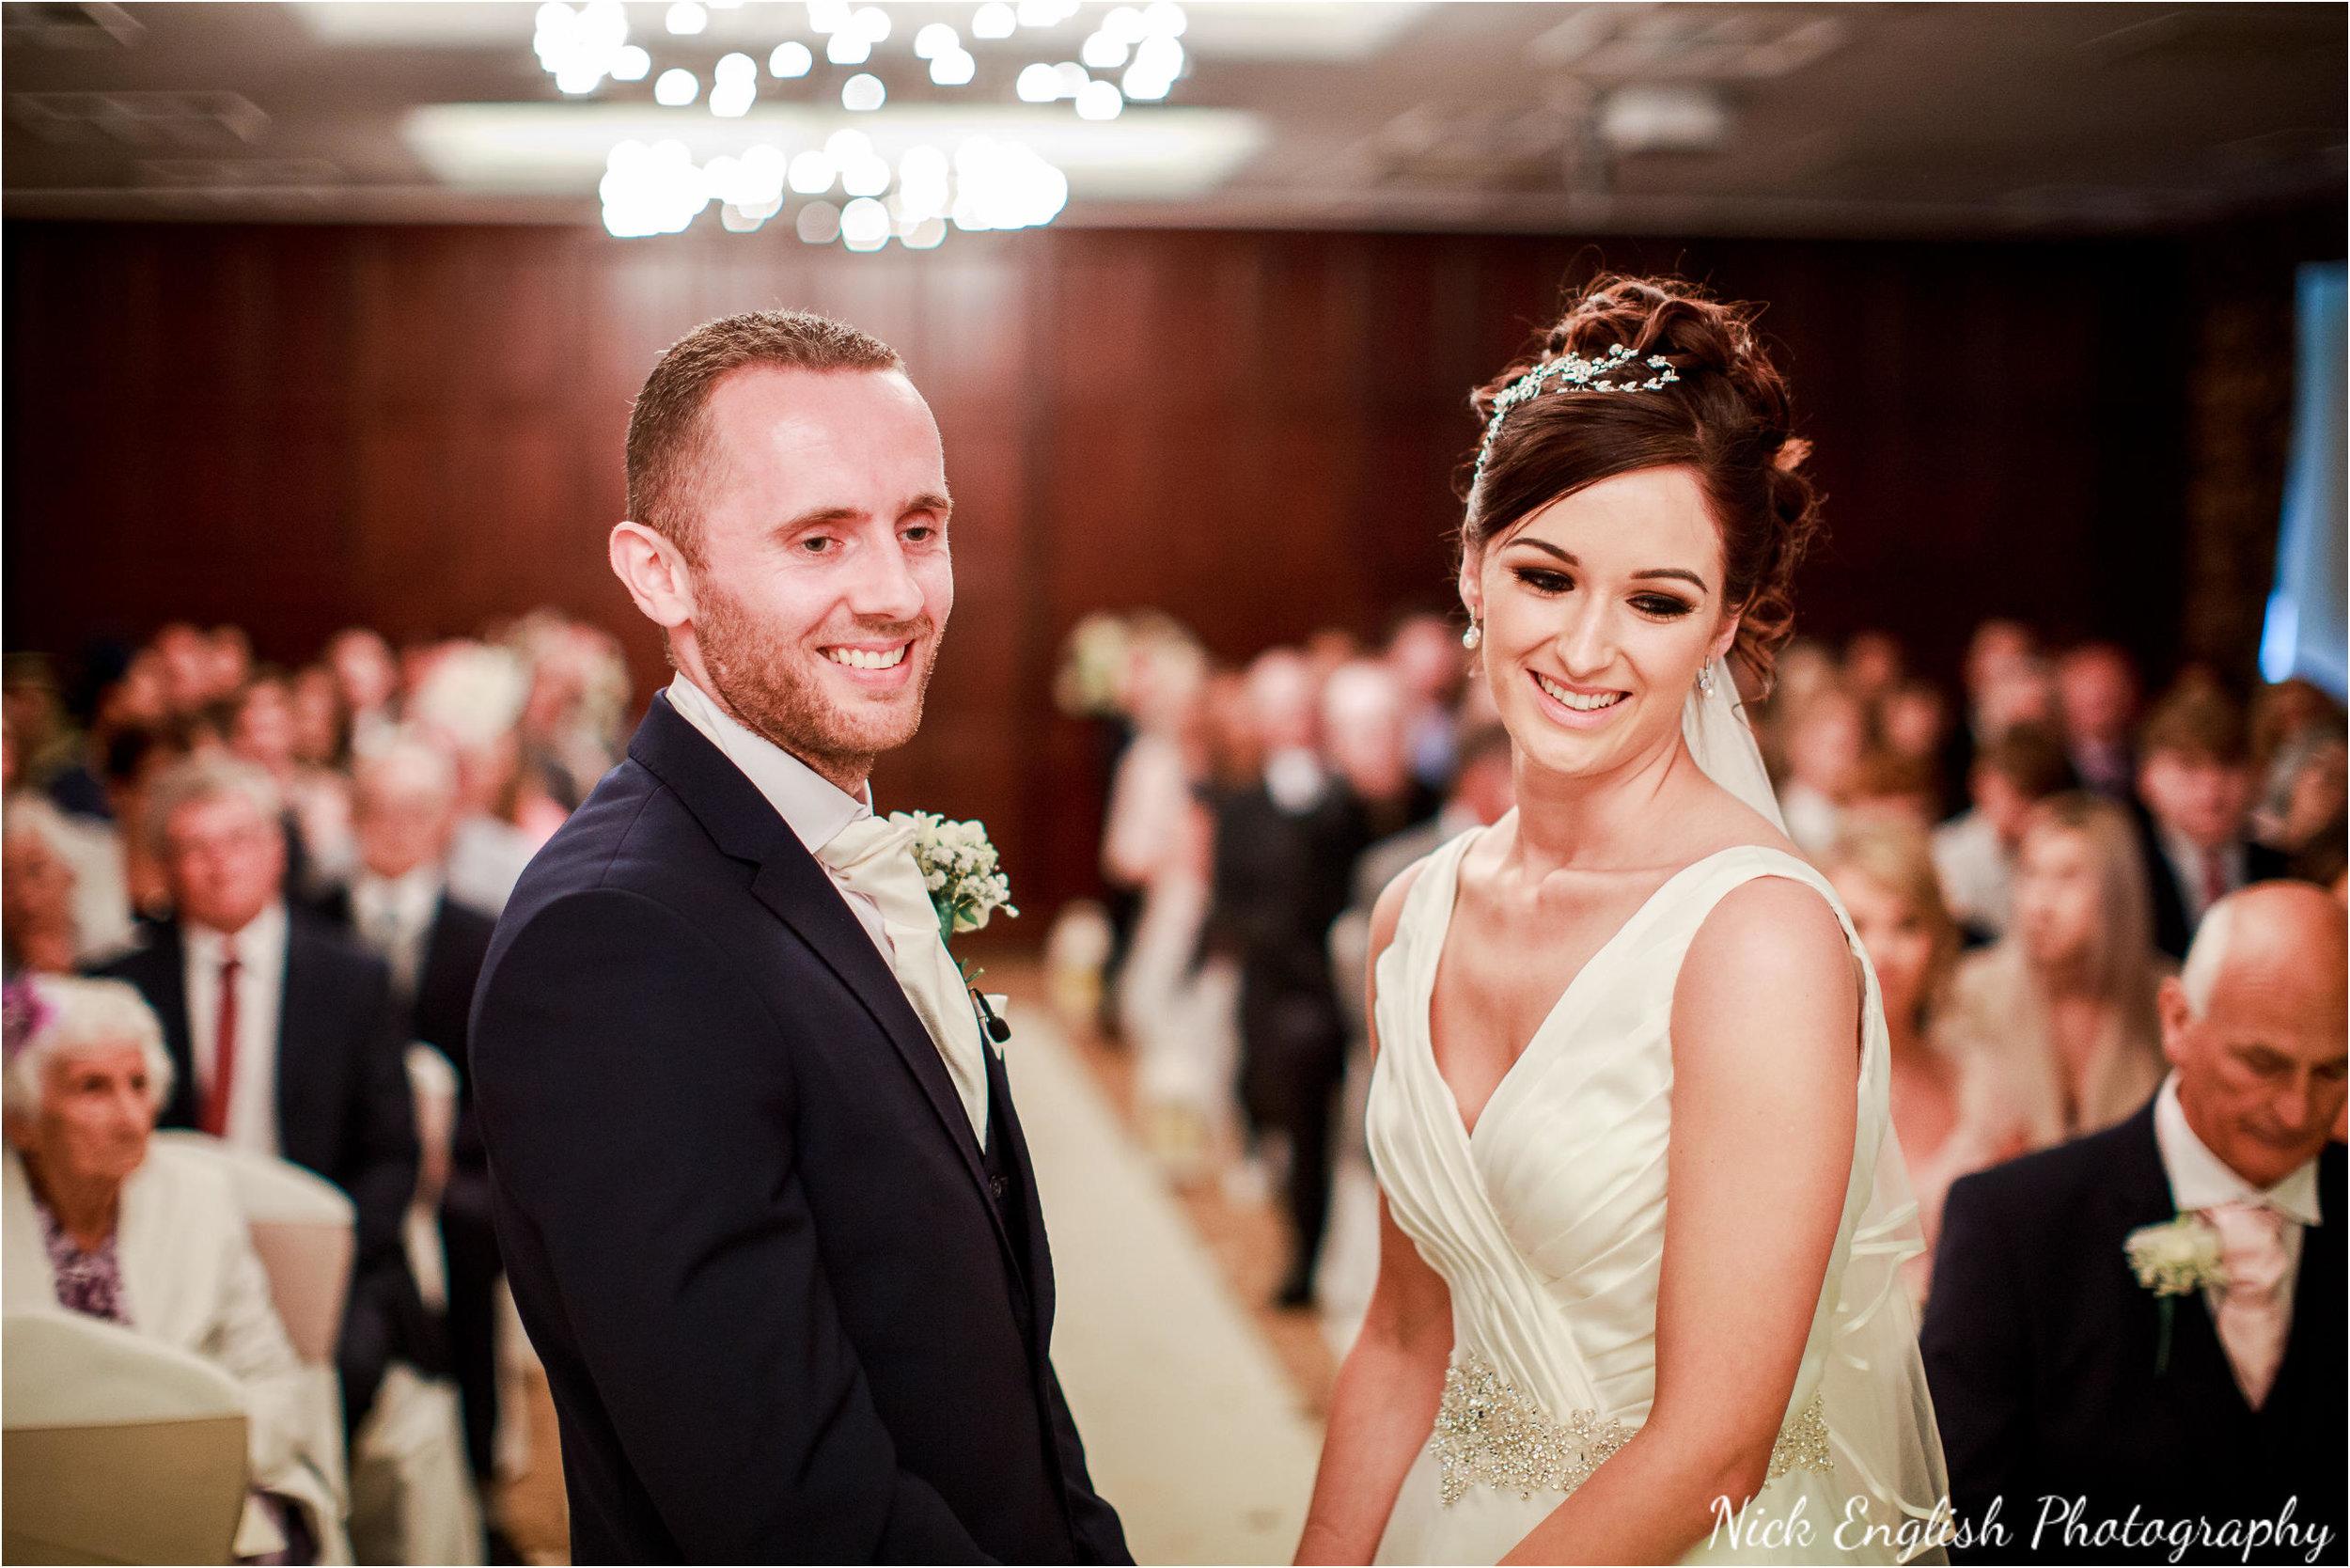 Emily David Wedding Photographs at Barton Grange Preston by Nick English Photography 60jpg.jpeg